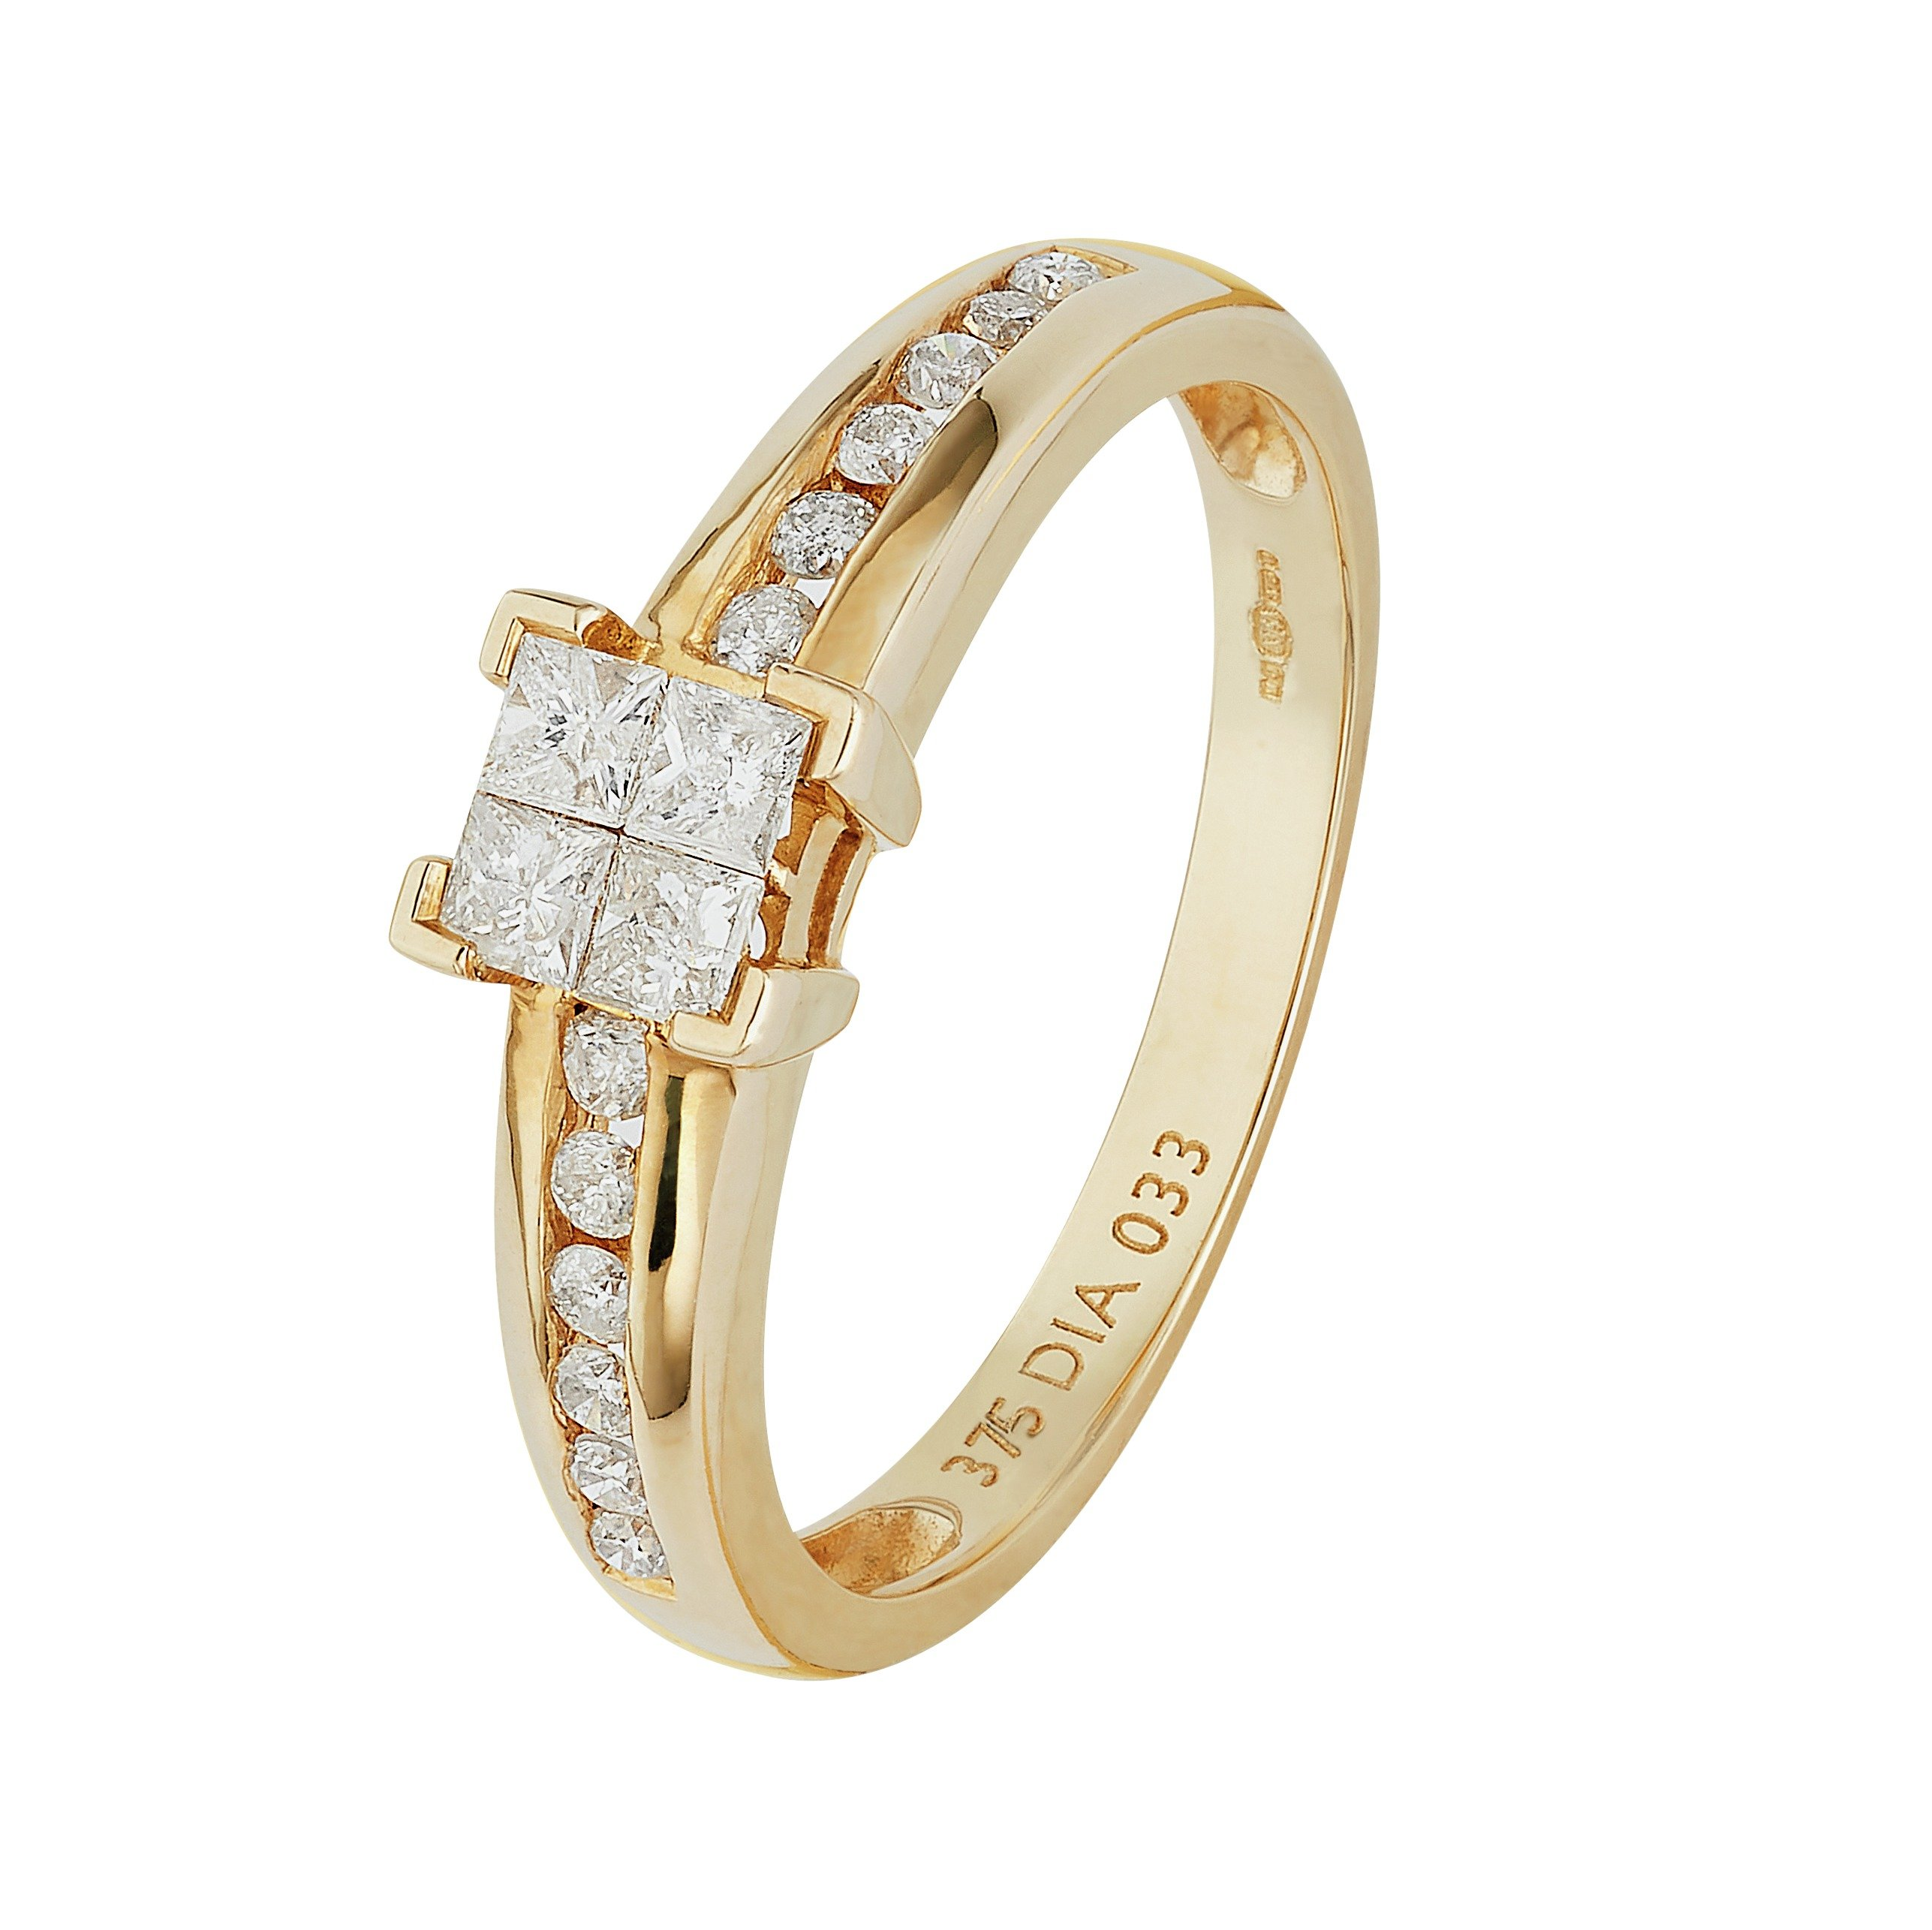 Buy Revere 9ct Gold 0 33ct tw Diamond Set Shoulder Ring at Argos